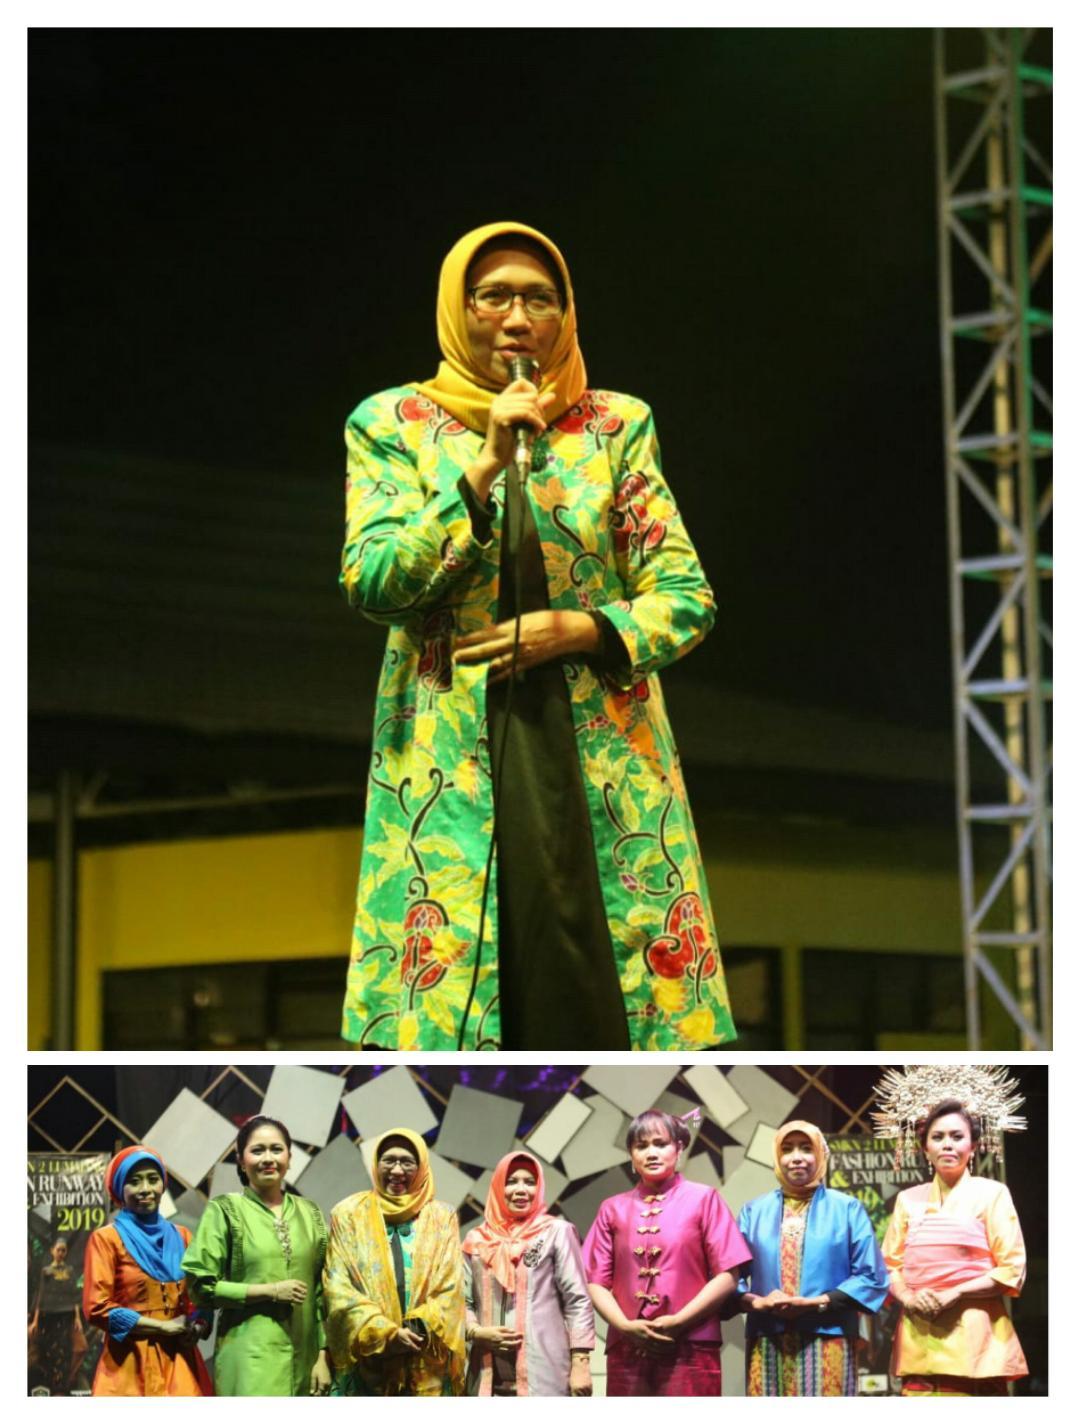 Menyambut Hari Kartini Wakil Bupati Lumajang Hadiri Acara Yang Digelar SMKN 2